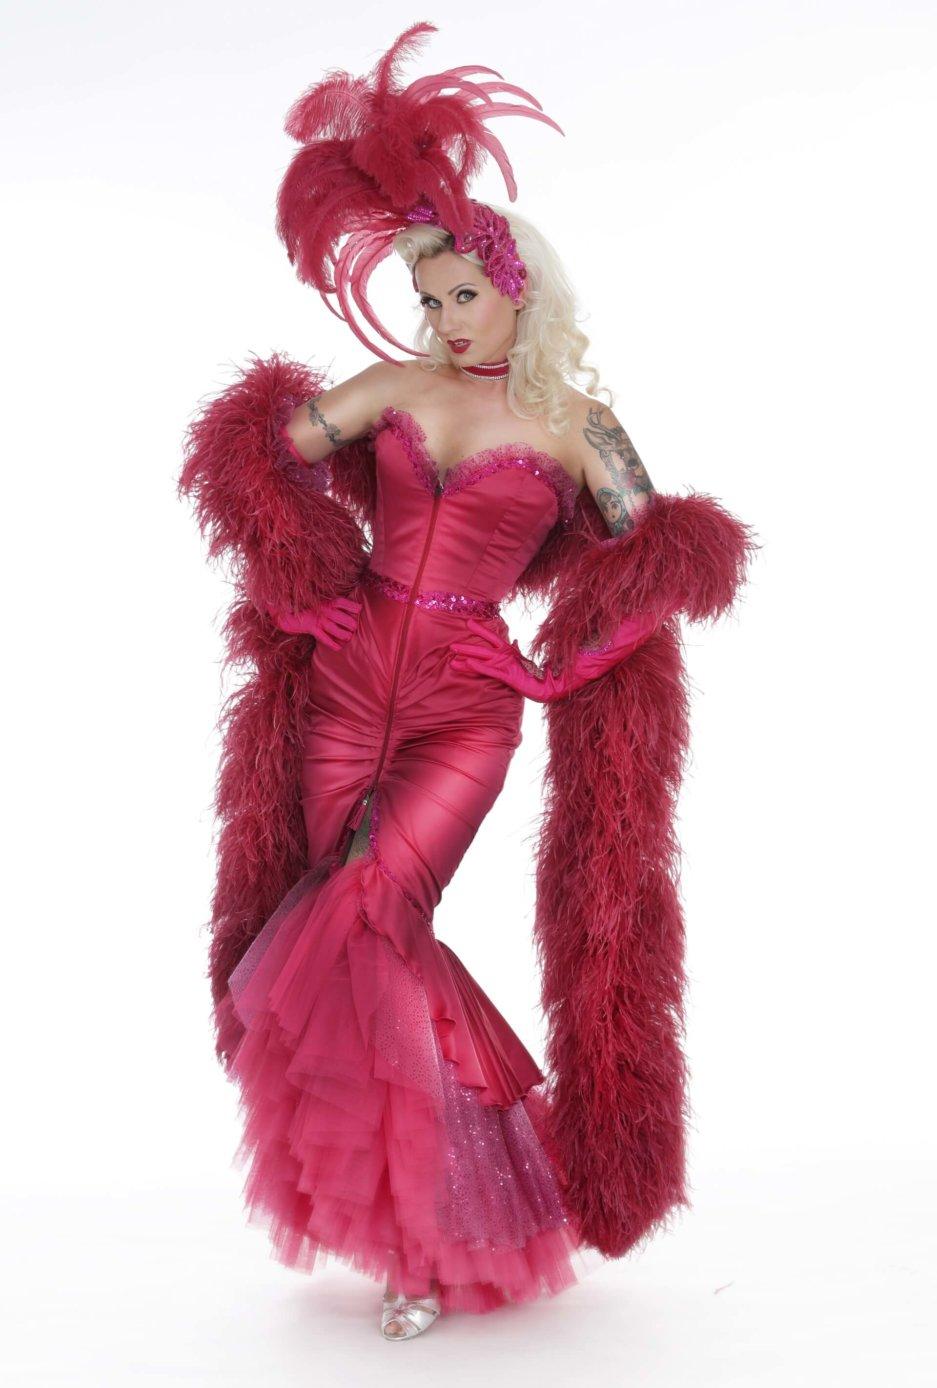 Rose Rainbow Burlesque Tänzerin Burlesque Show buchen